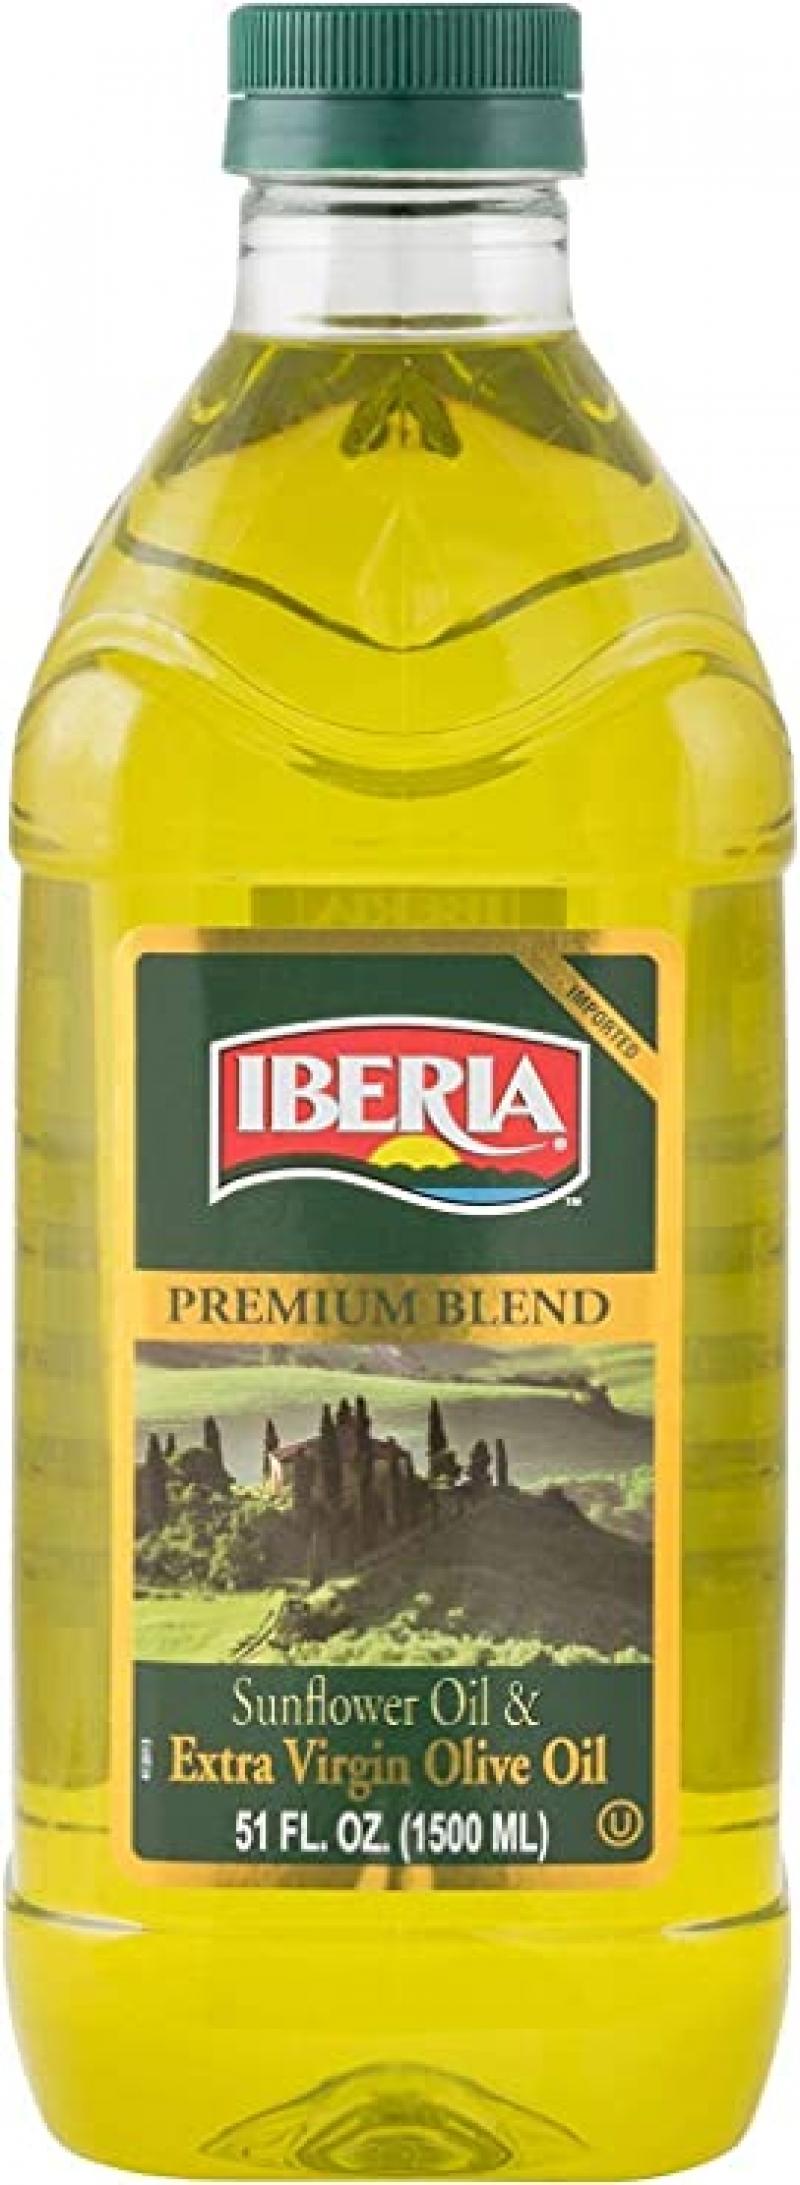 ihocon: Iberia Extra Virgin Olive Oil & Sunflower Oil Blend, 51 oz, High Heat Frying 特級初榨橄欖油及葵花籽油